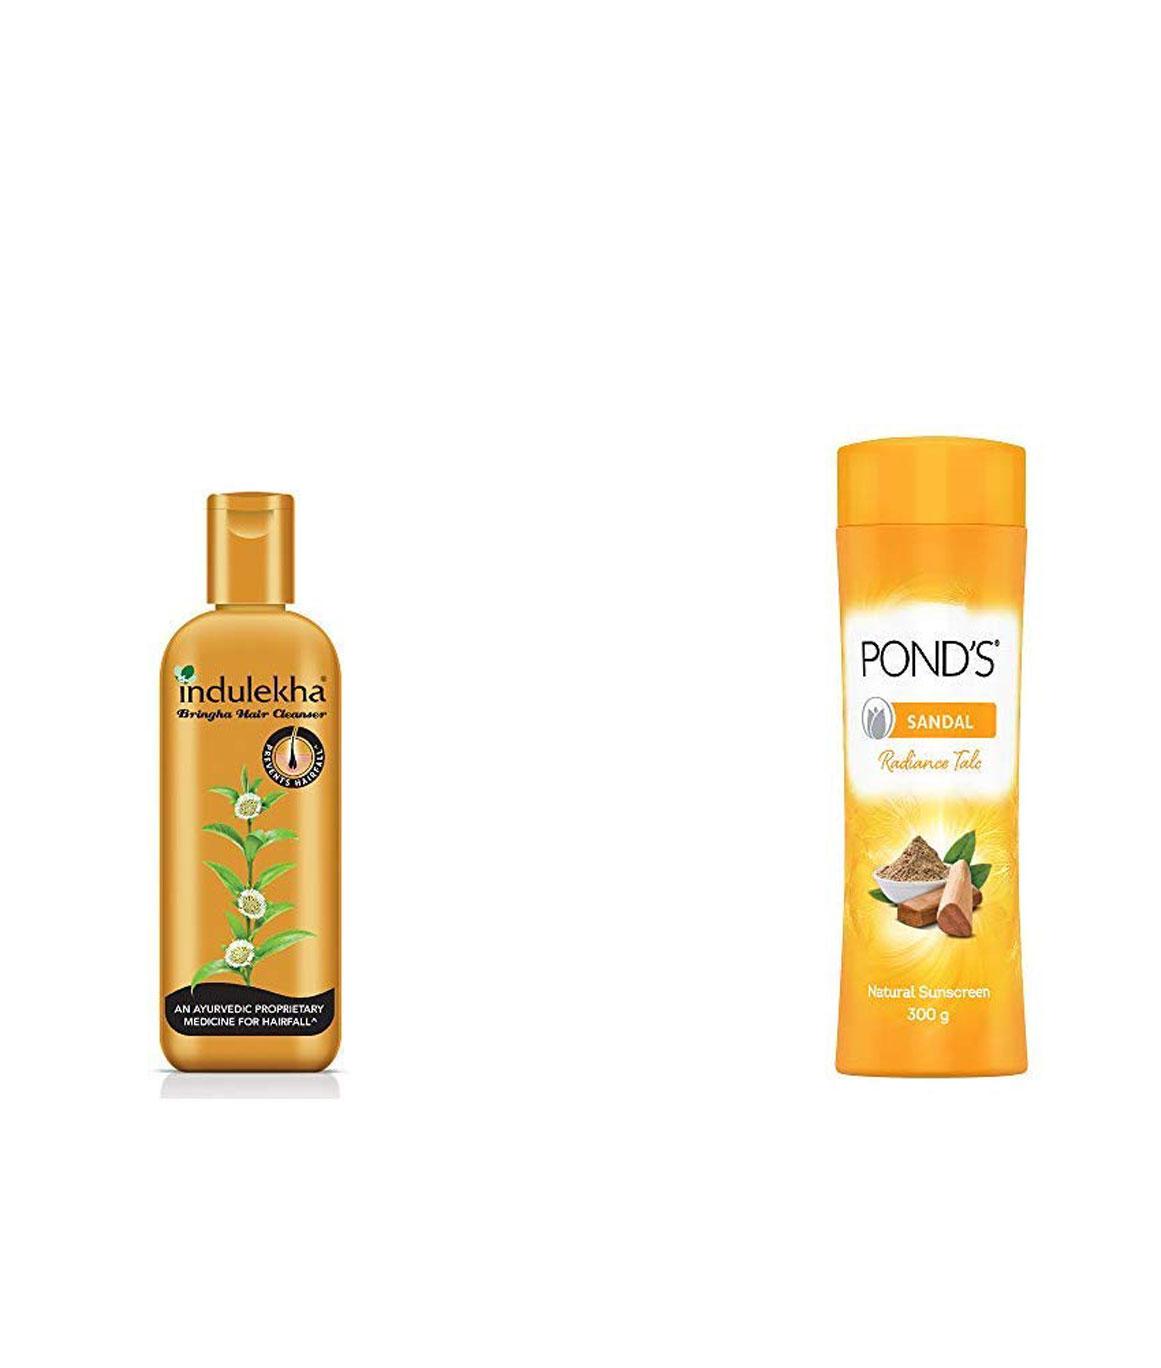 Indulekha Bringha Anti Hair Fall Shampoo, 200ml & PONDeS Sandal Radiance Talcum Powder, Natural Sunscreen, 300 gm